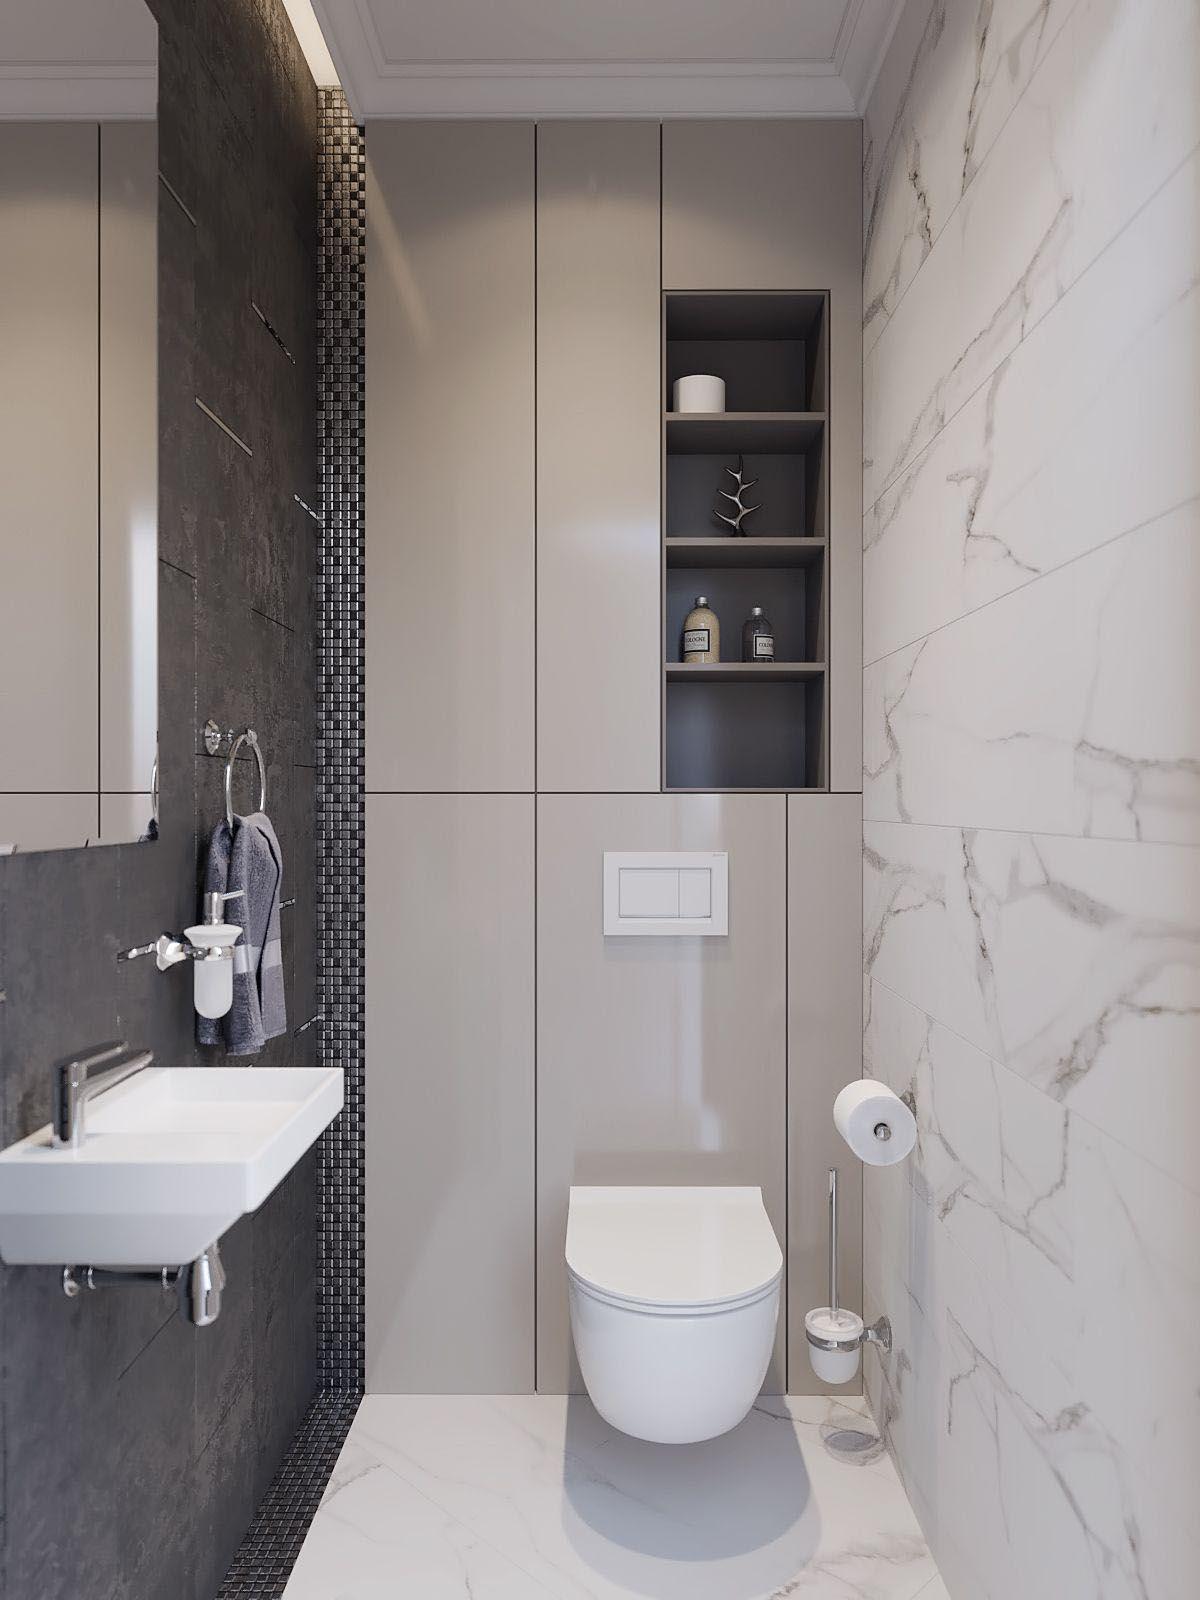 25 Creative Storage Ideas To Organize Your Small Bathroom Small Bathroom Storage Small Bathroom Small Toilet Room